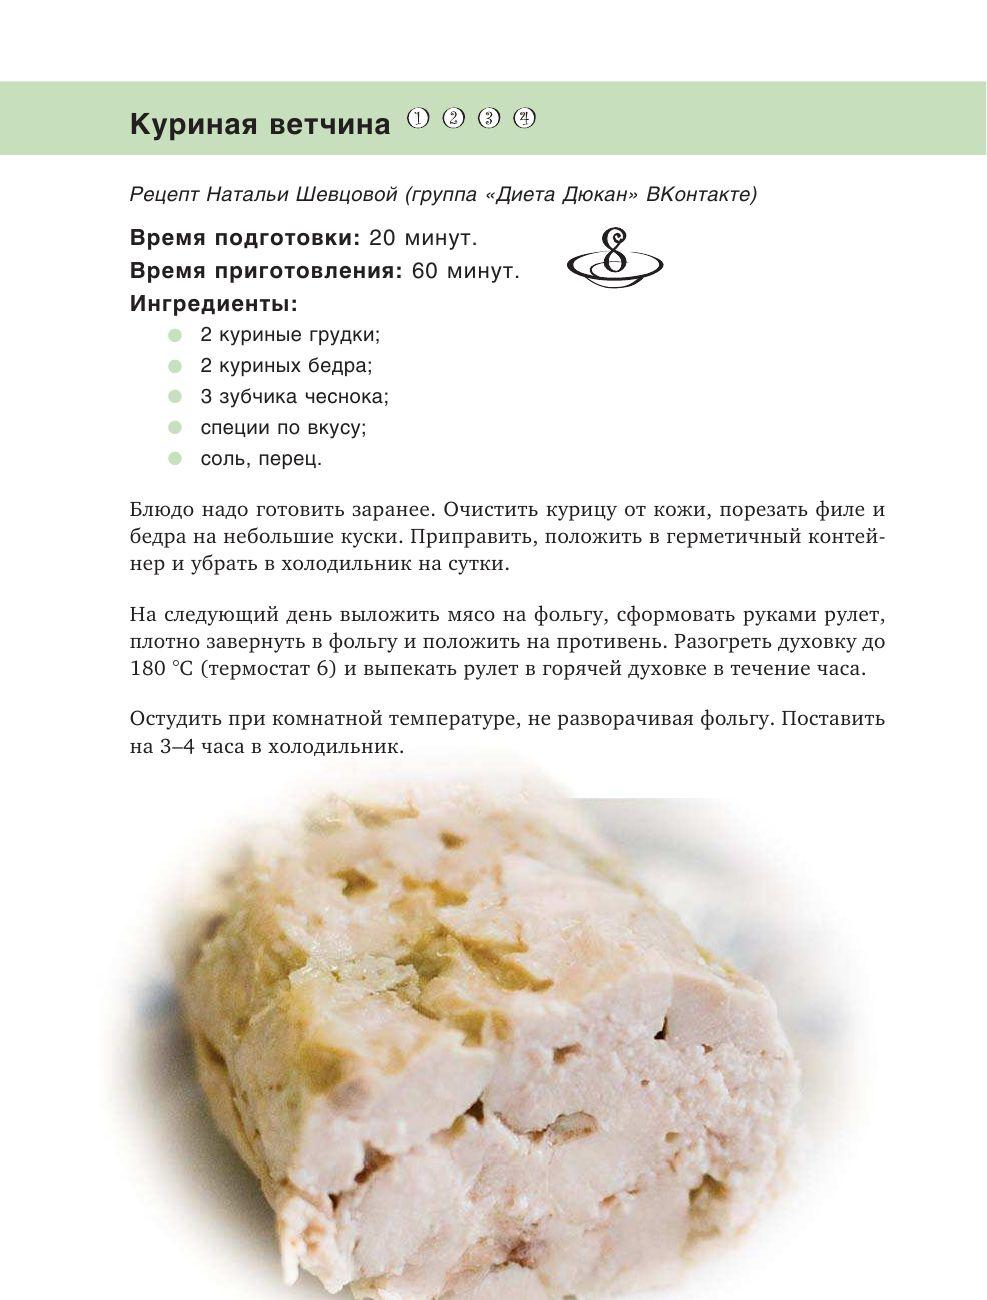 Какие блюда можно приготовить на диете дюкана